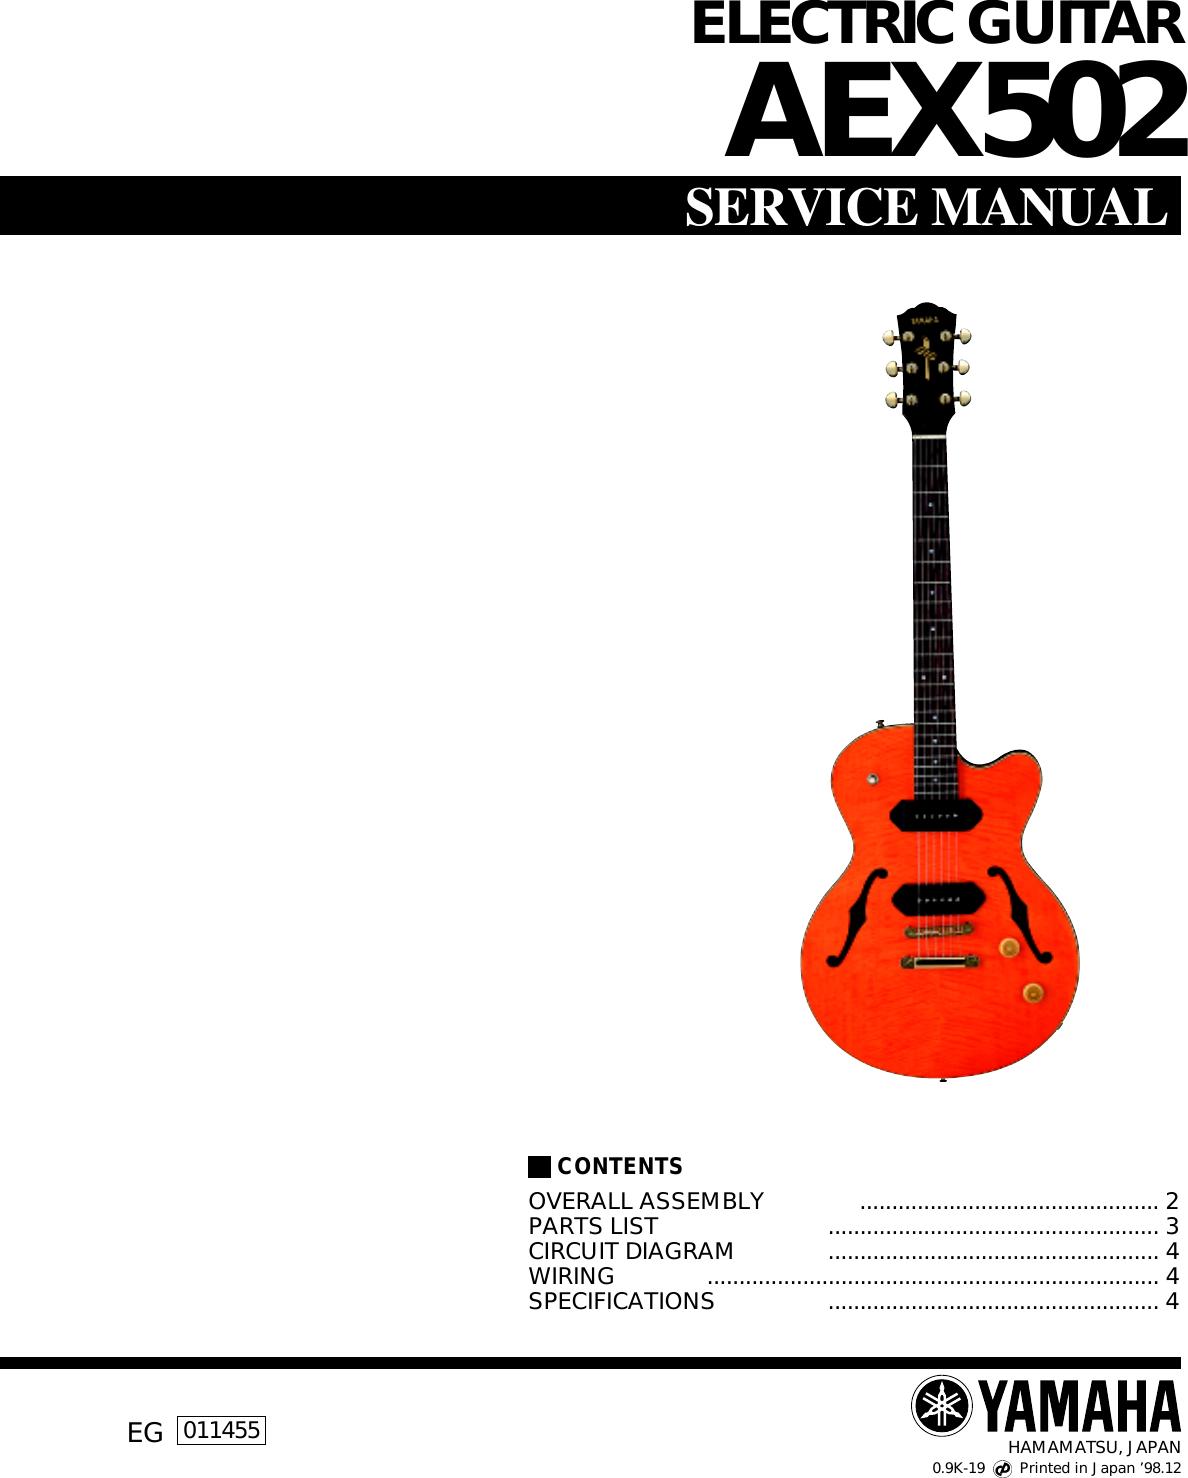 Yamaha Guitar Aex502 Users Manual Electric Humbucker Pickup Wiring